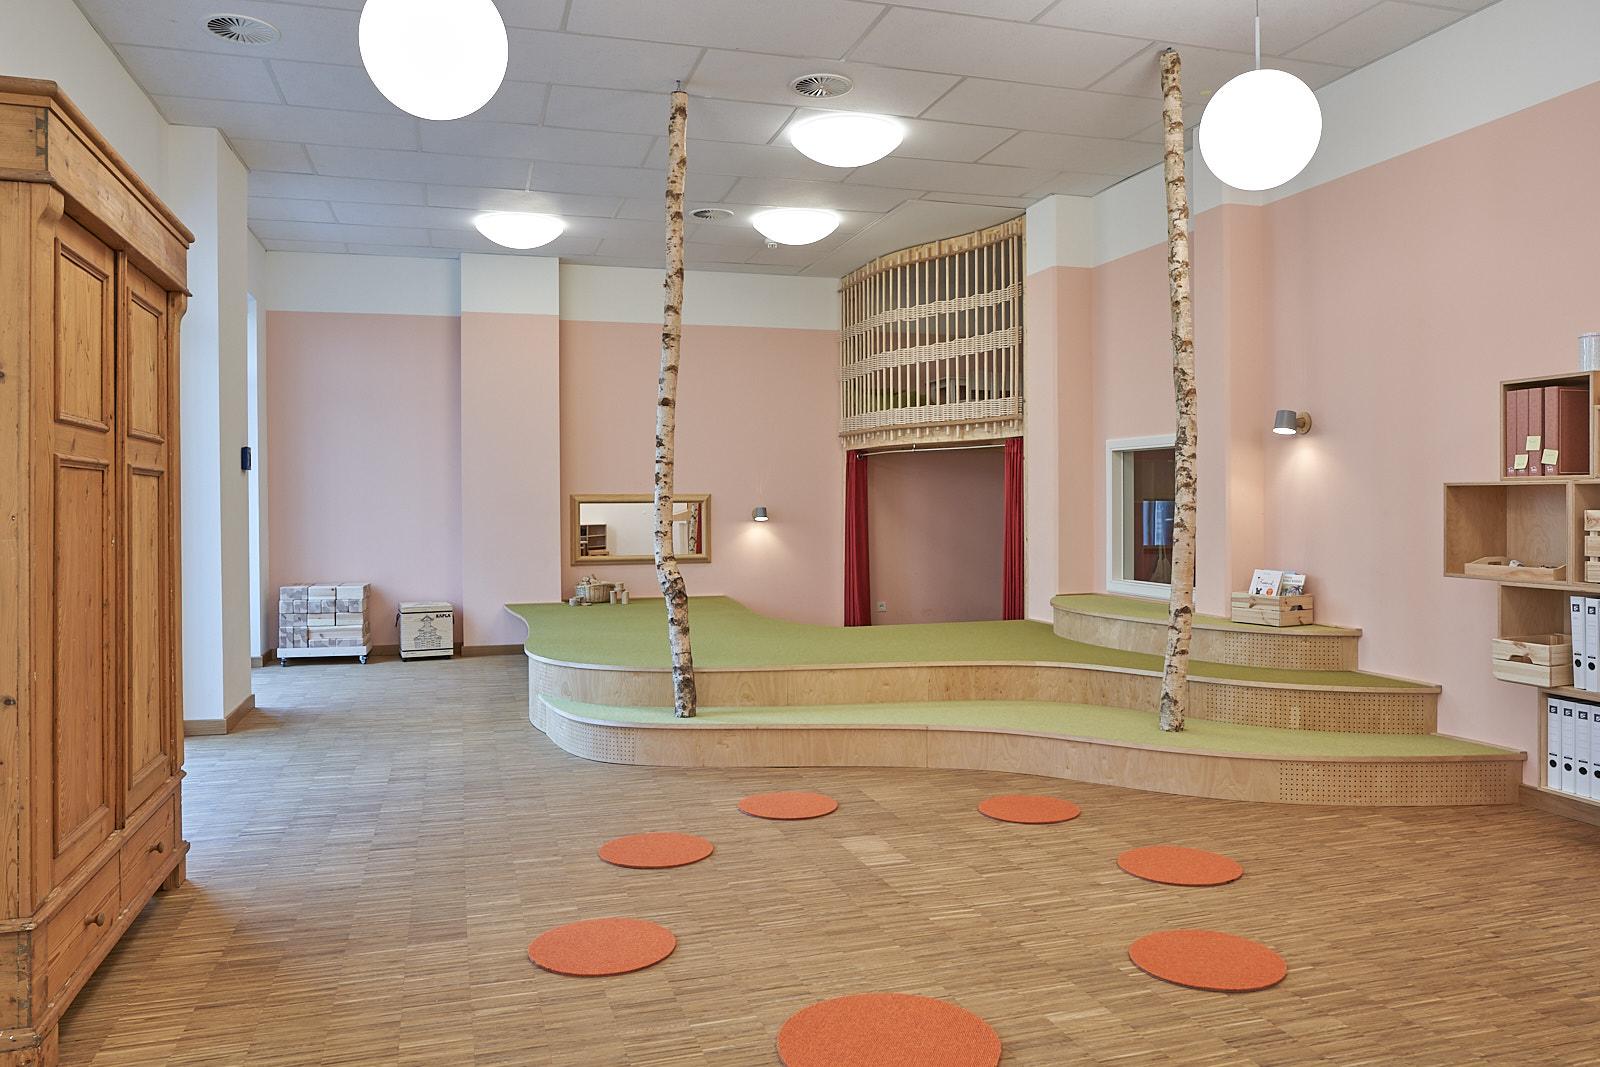 Hamburg, Neue Mitte Altona, Moete, Kita Sandvika, Bauraum, Baupodest, Rollenspiel, Kita, Kindergarten, Kindertagesstätte, Krippe 01.jpg